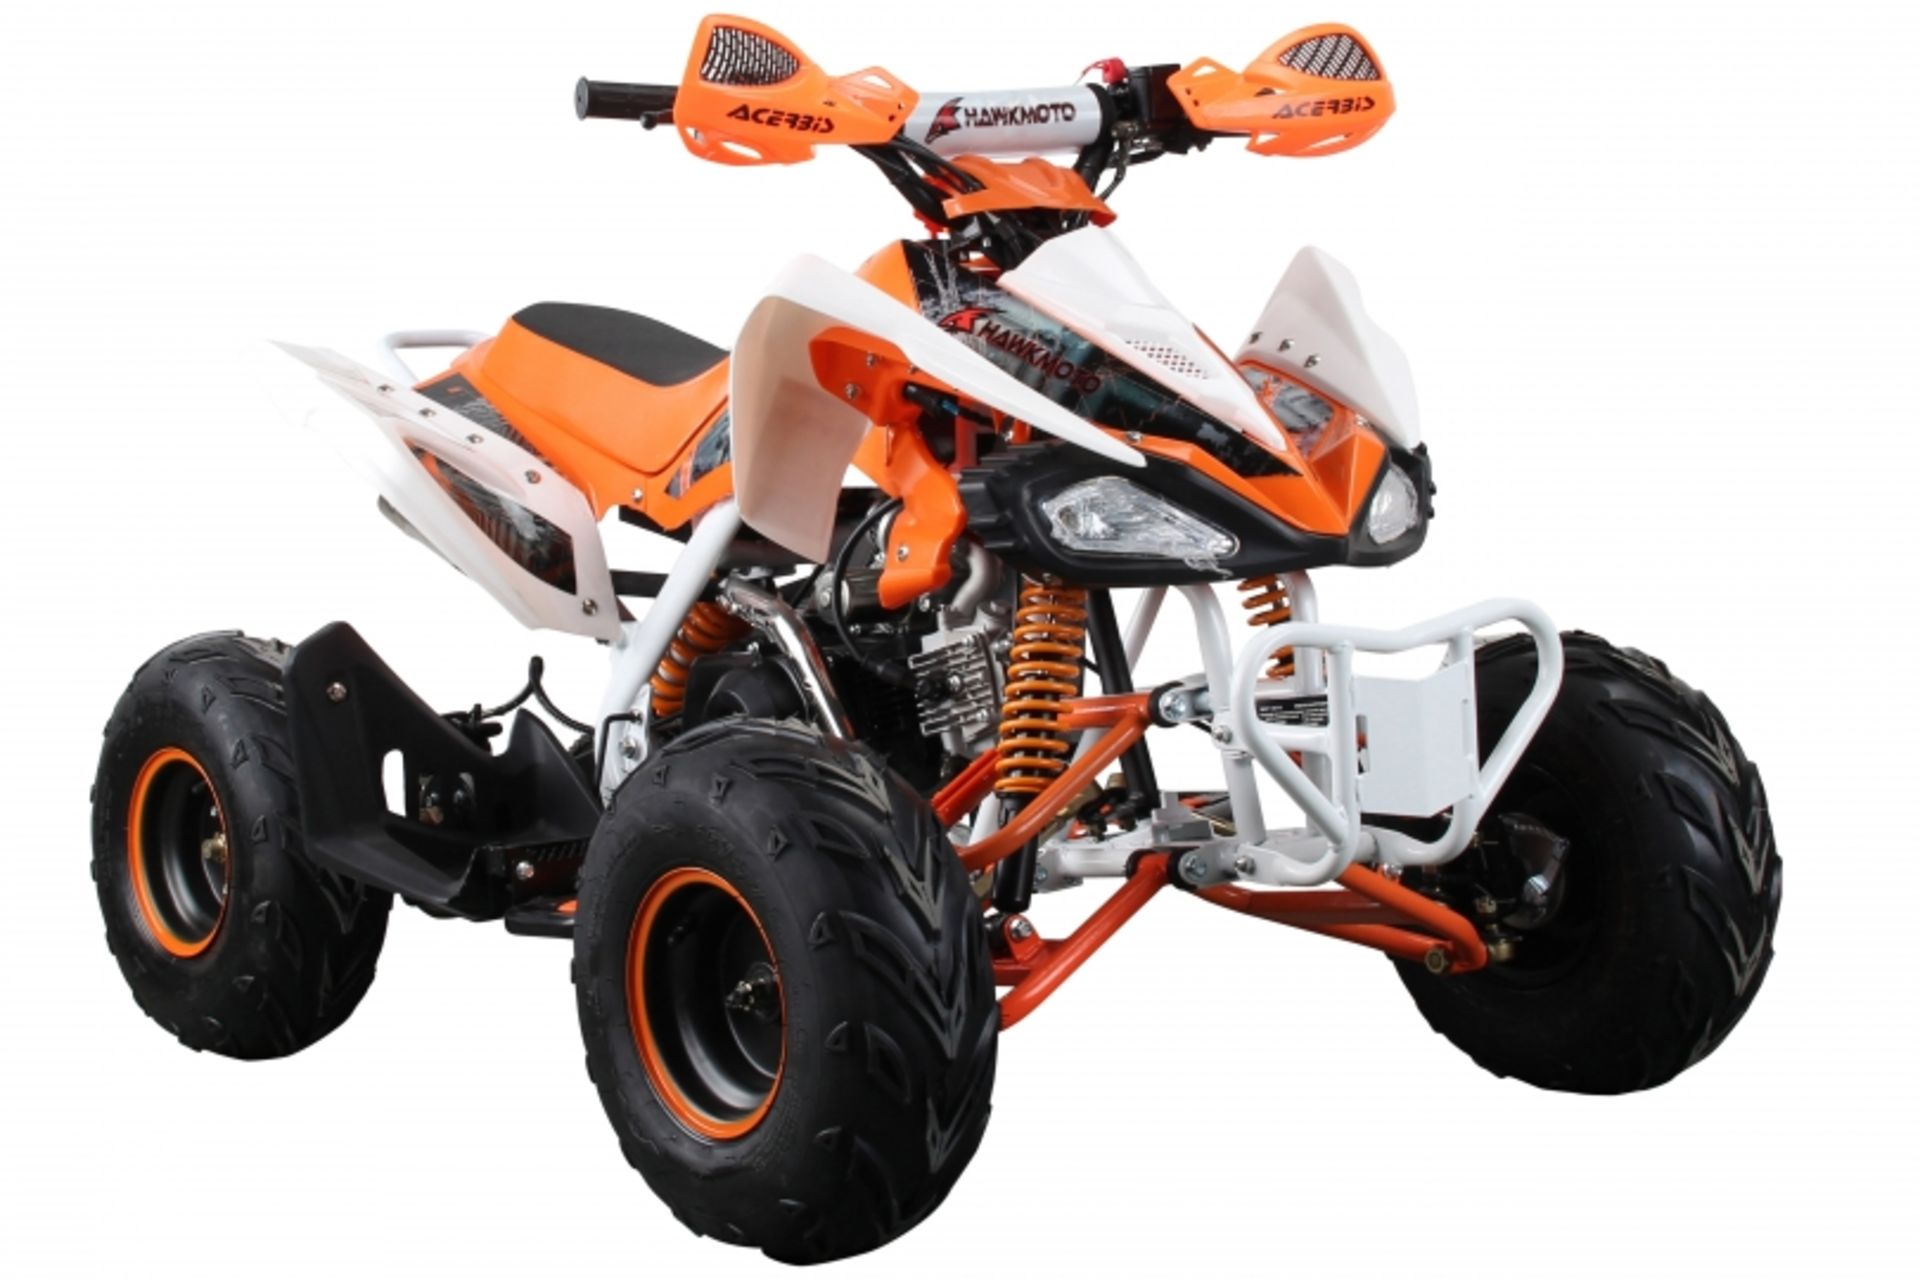 Lot 23529 - V Brand New 125cc Interceptor SV2 4 Stroke Quad Bike With Reverse Gear - Double Front Suspension/